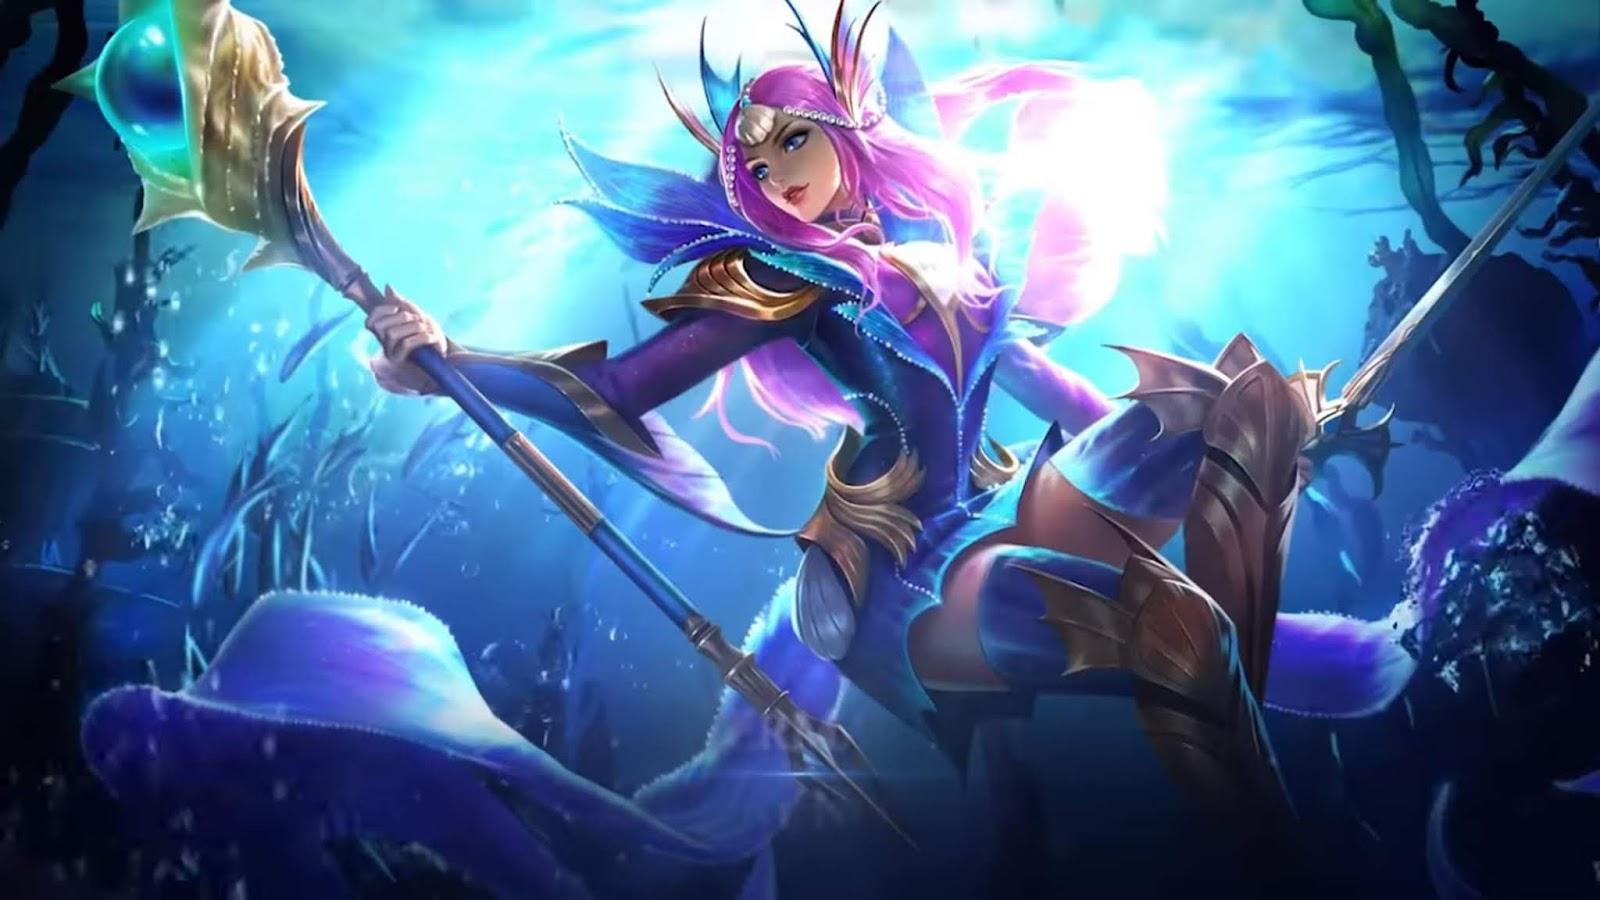 Wallpaper Odette Mermaid Princess Skin Mobile Legends HD for PC